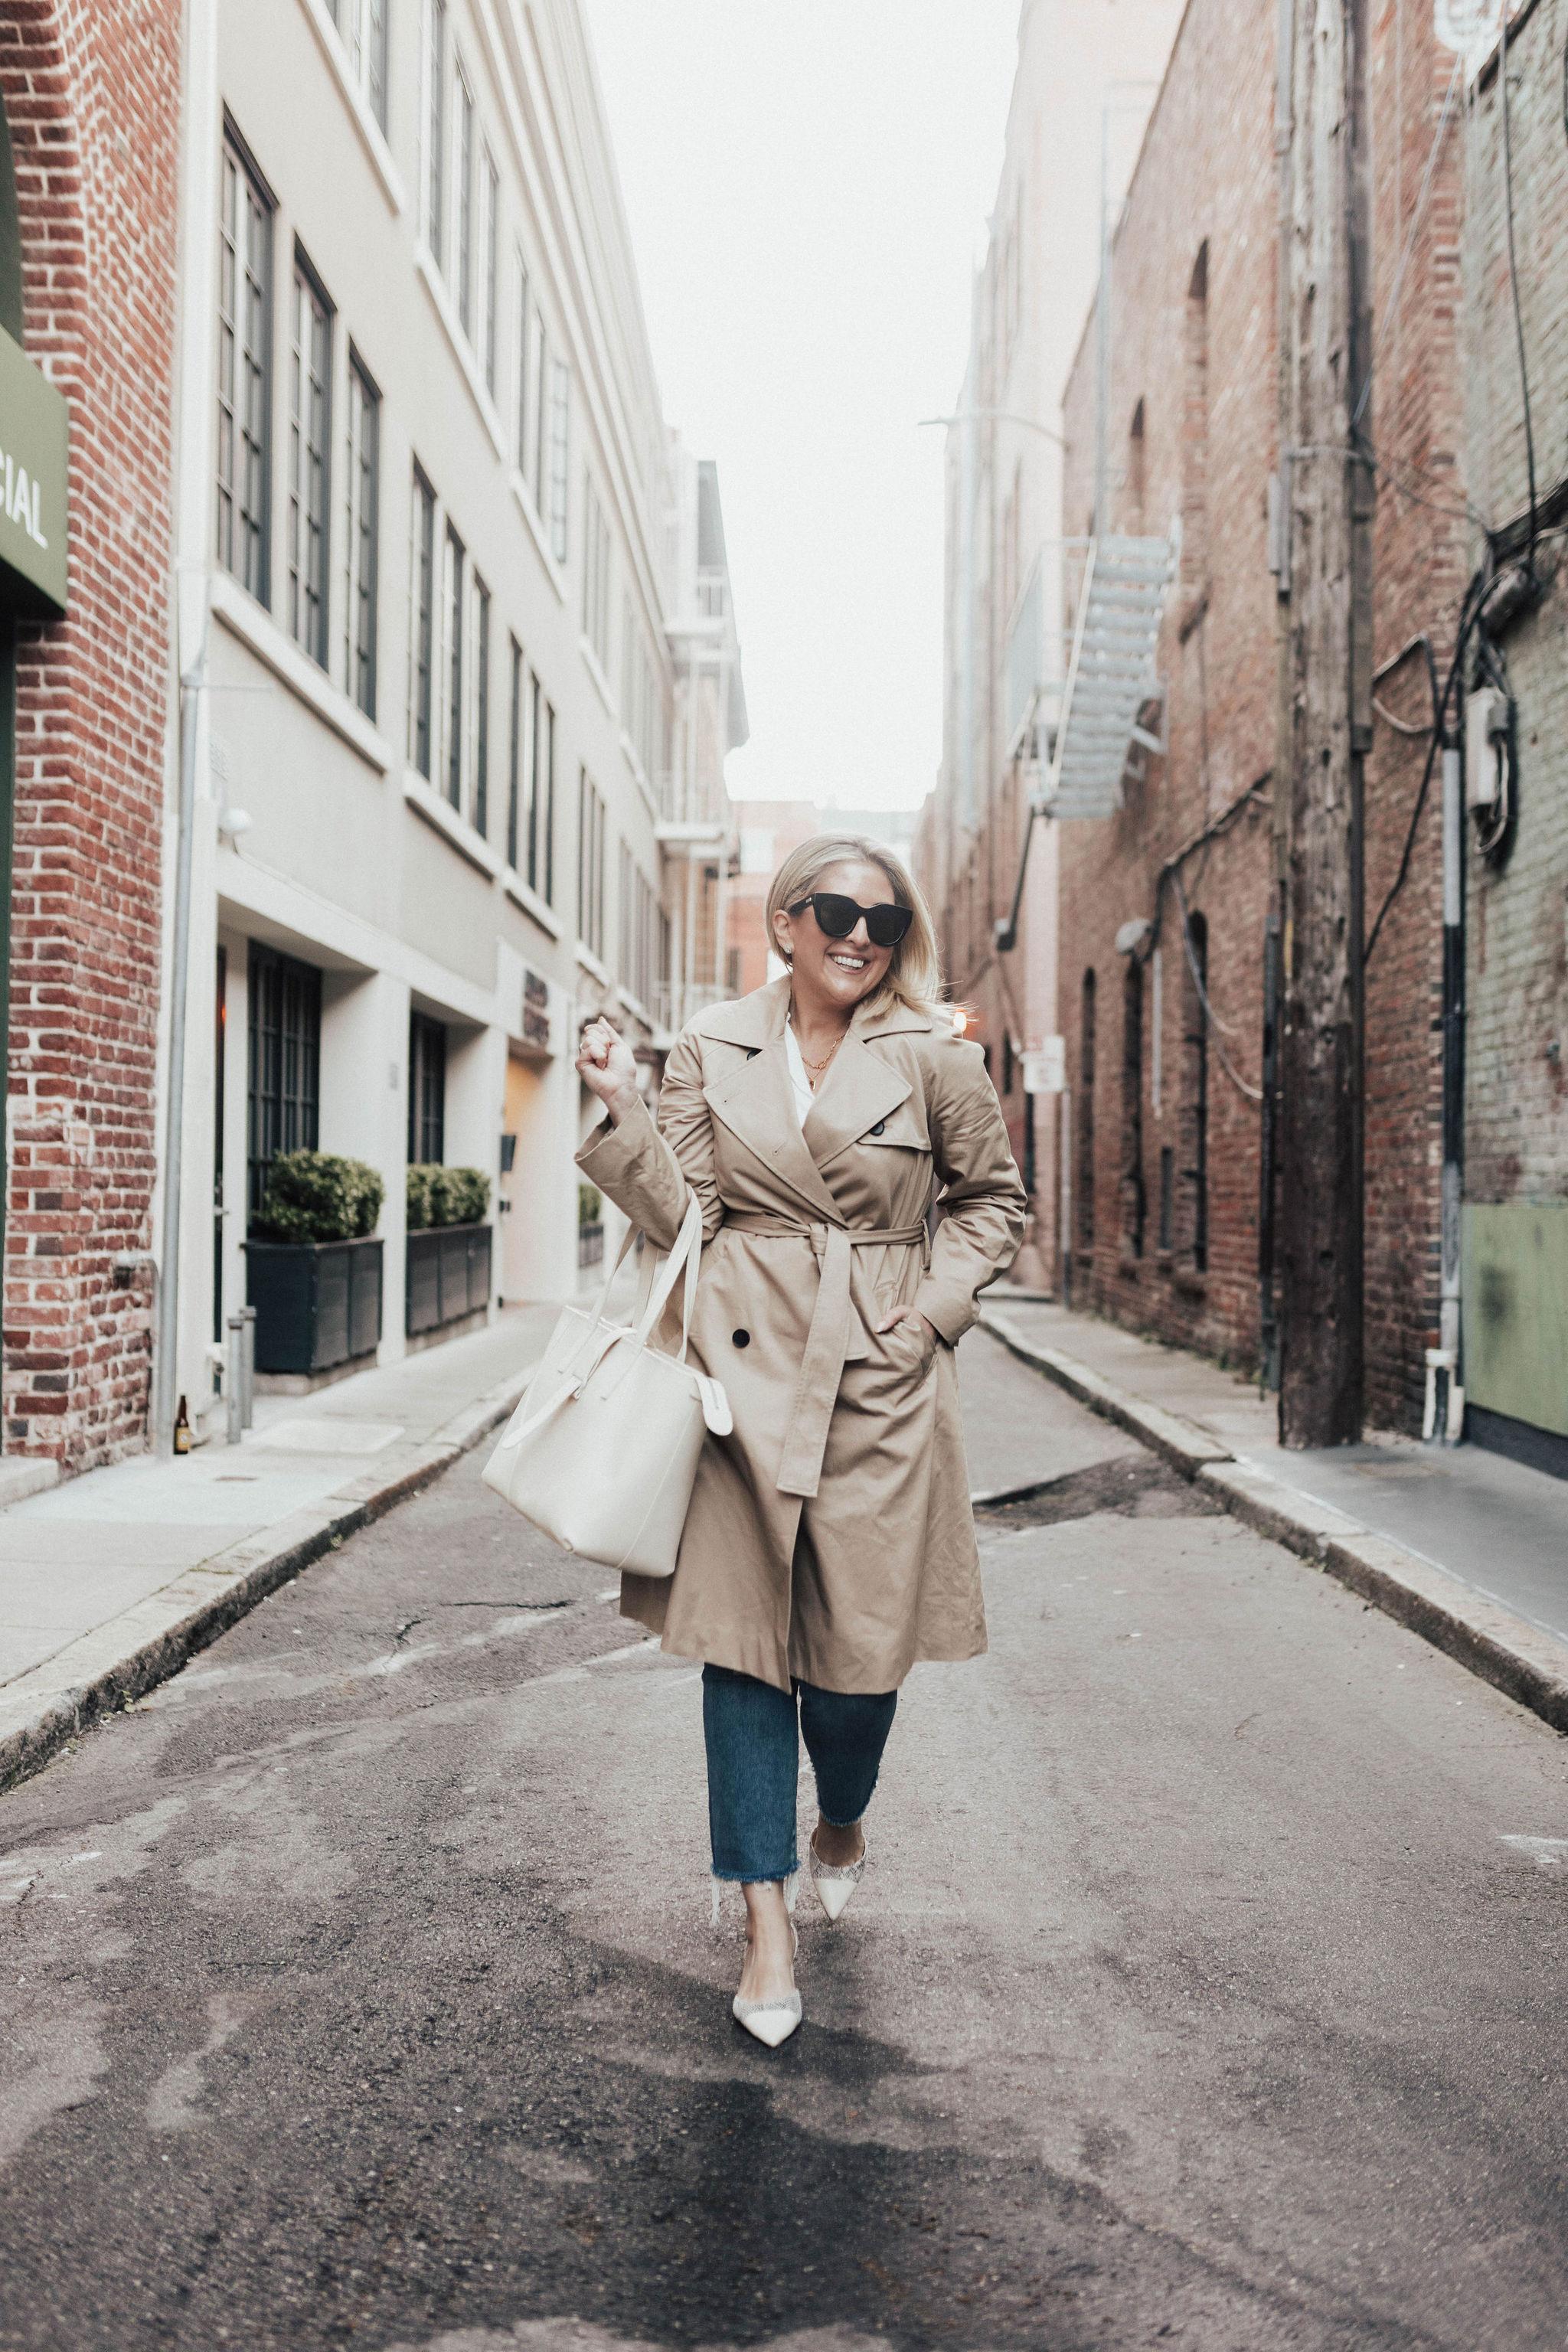 Everlane Lookbook, Style Inspired By Angelina Jolie, KatWalkSF wears an Everlane trench and SENREVE Voya tote